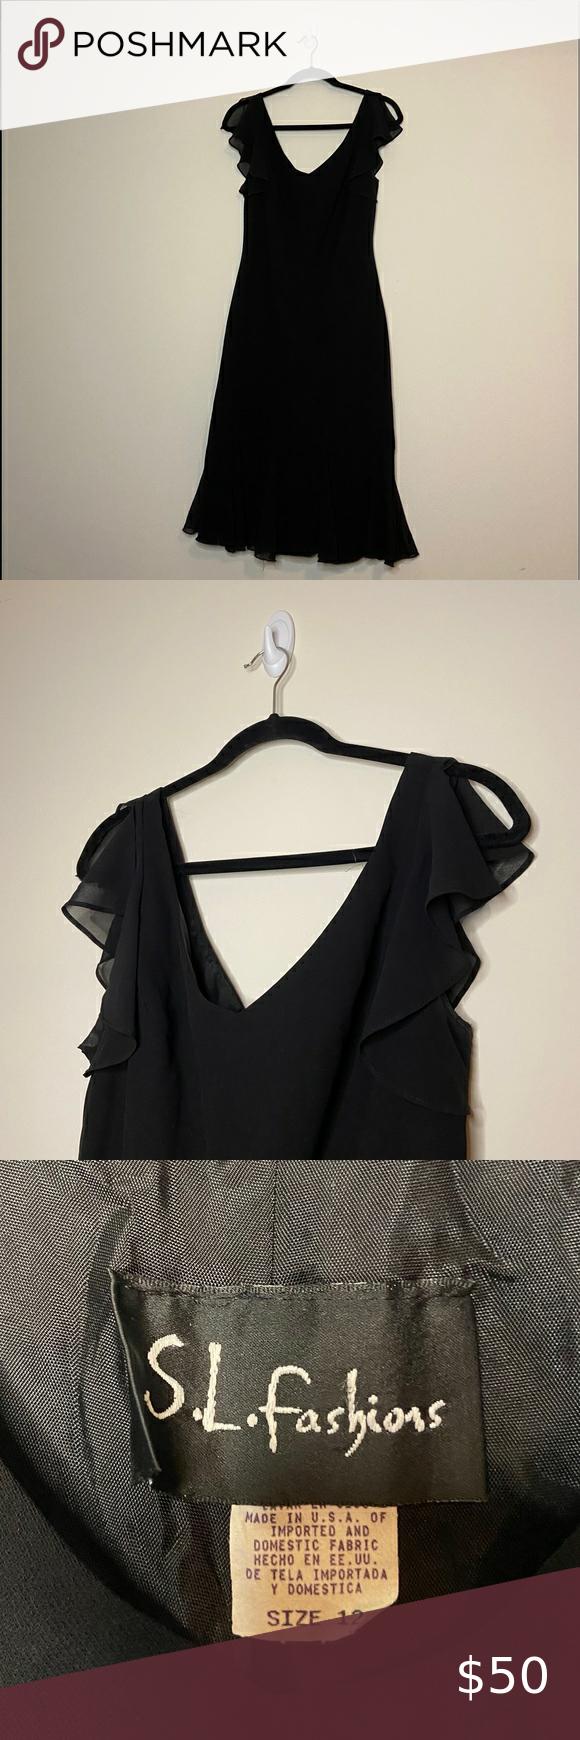 S L Fashions Vintage Black Dress Vintage Black Dress Vintage Fashion Fashion [ 1740 x 580 Pixel ]